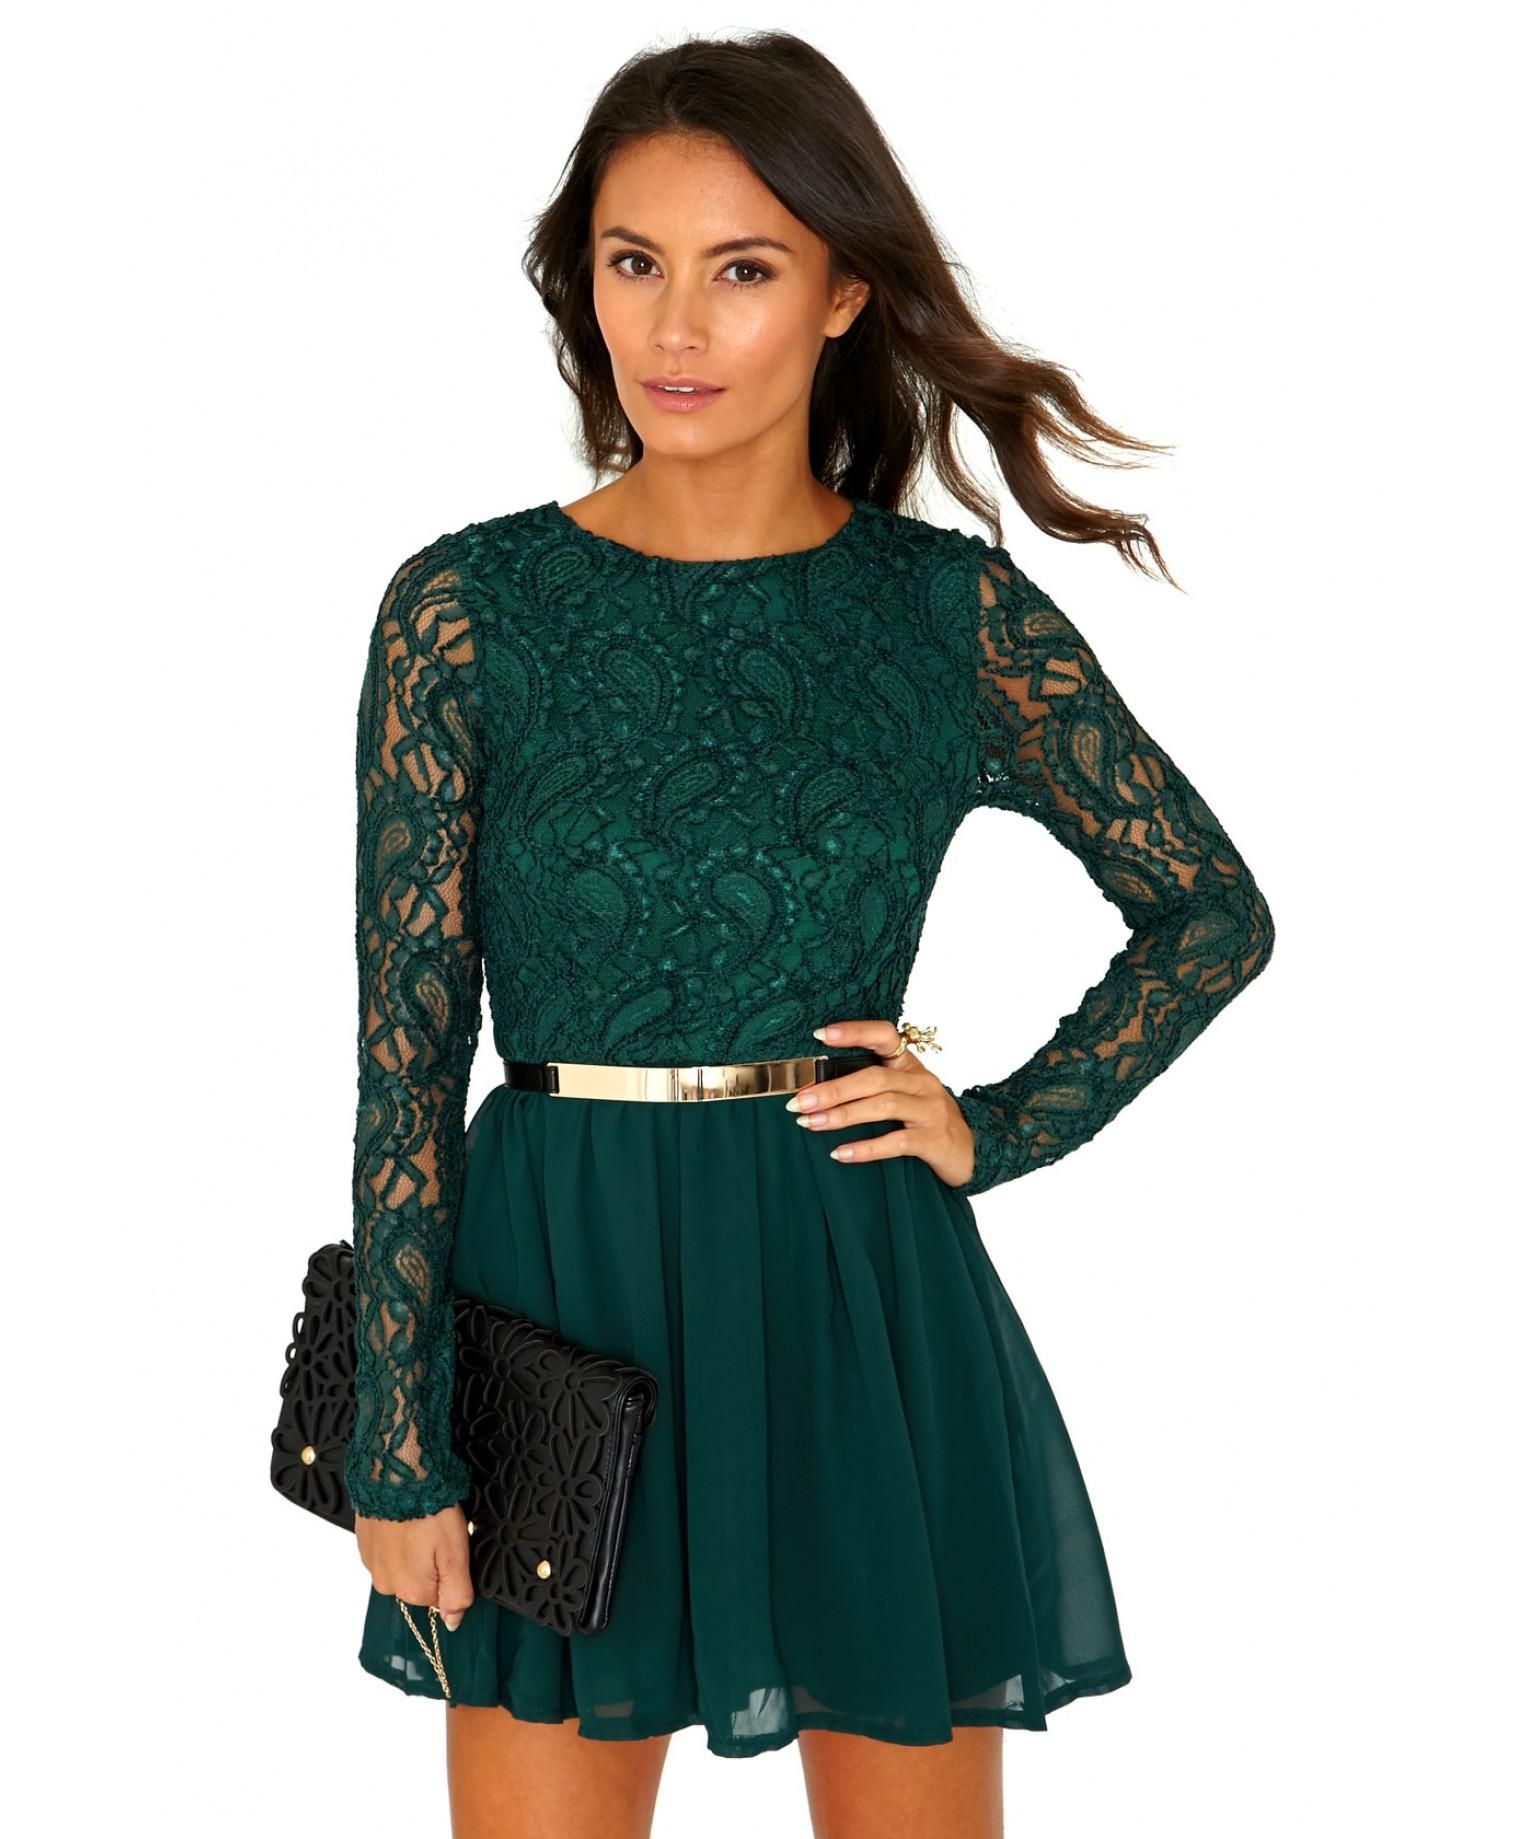 Lace Skater Dresses Picture Collection Dressedupgirlcom